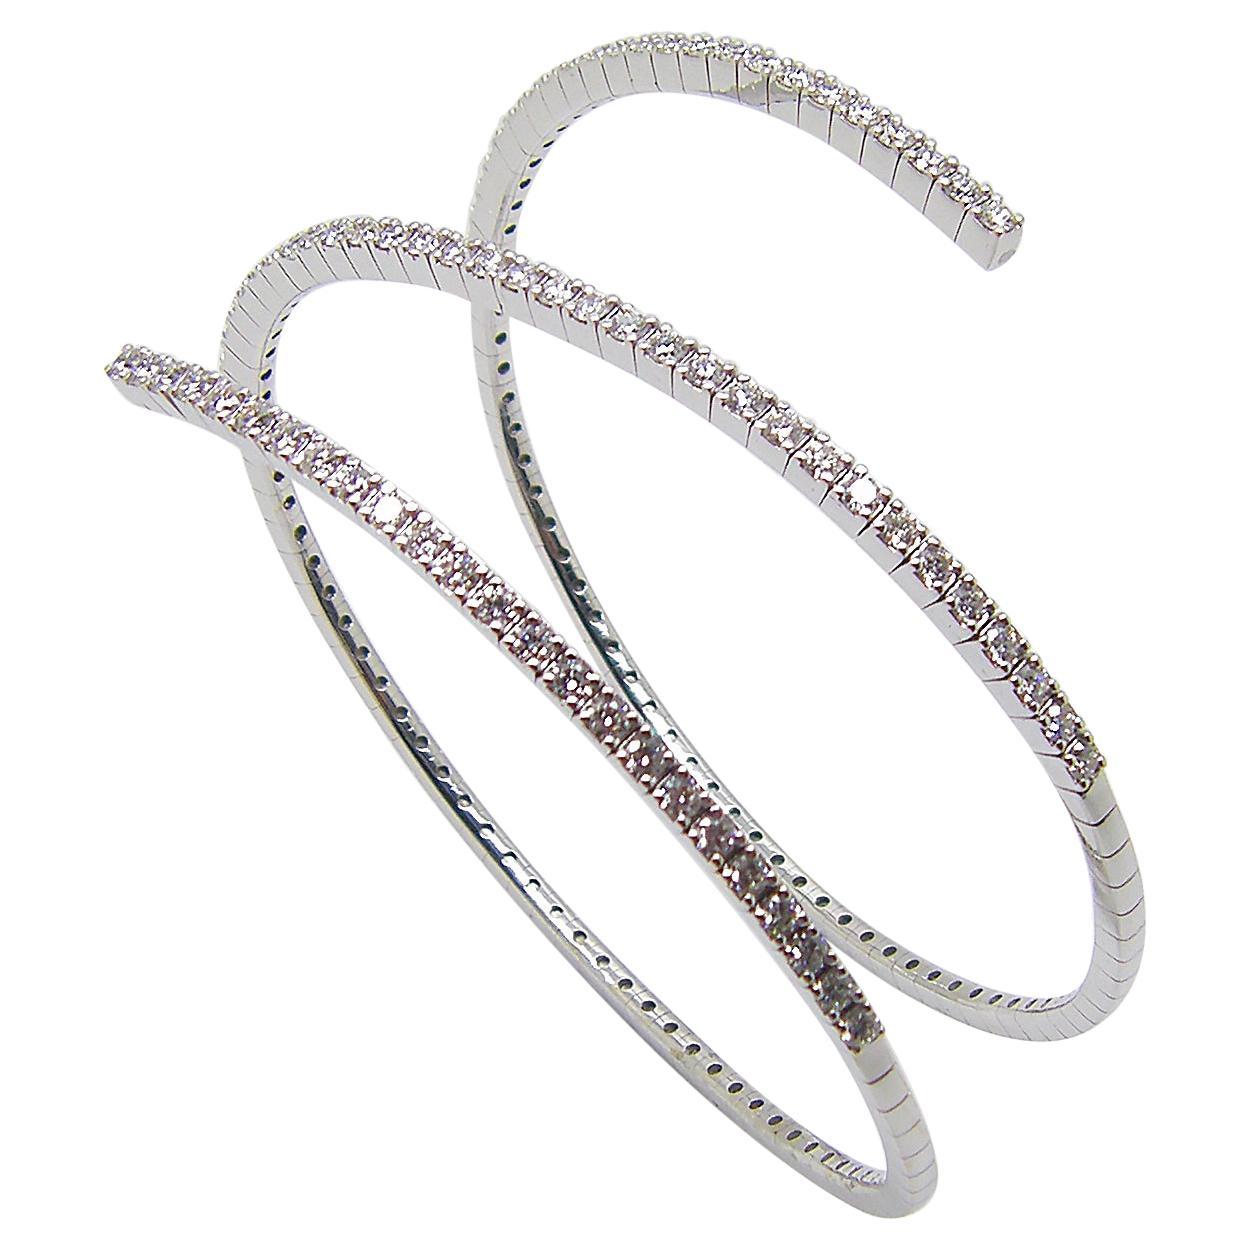 Georgios Collections 18 Karat White Gold Brilliant Cut Diamond Wrap Bracelet